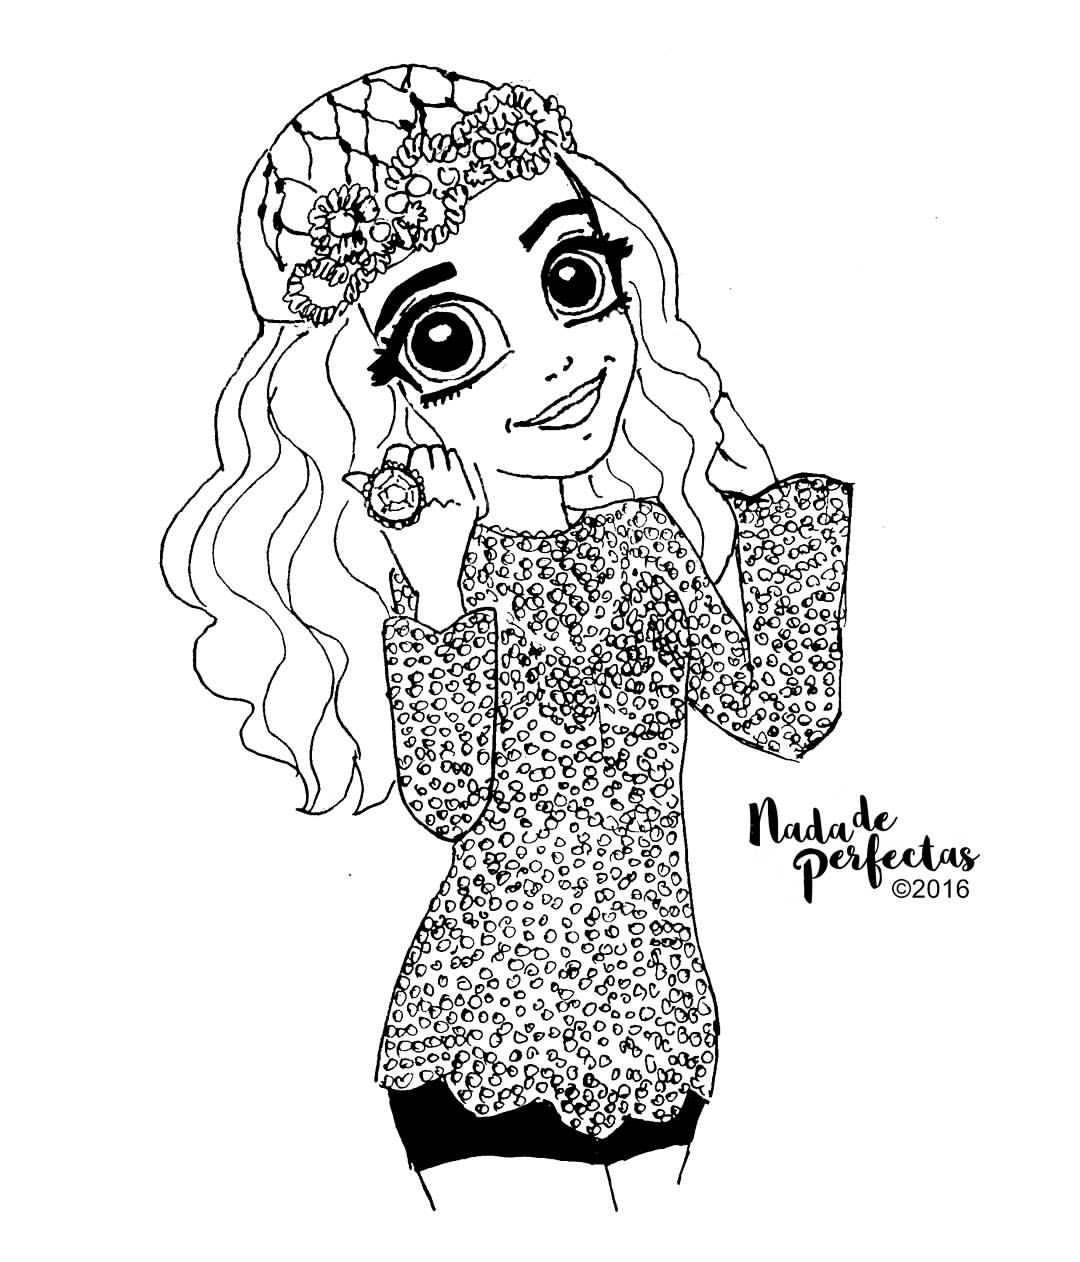 Tomorrow will be the birthday of this talented girl! @VanessaMarano ...